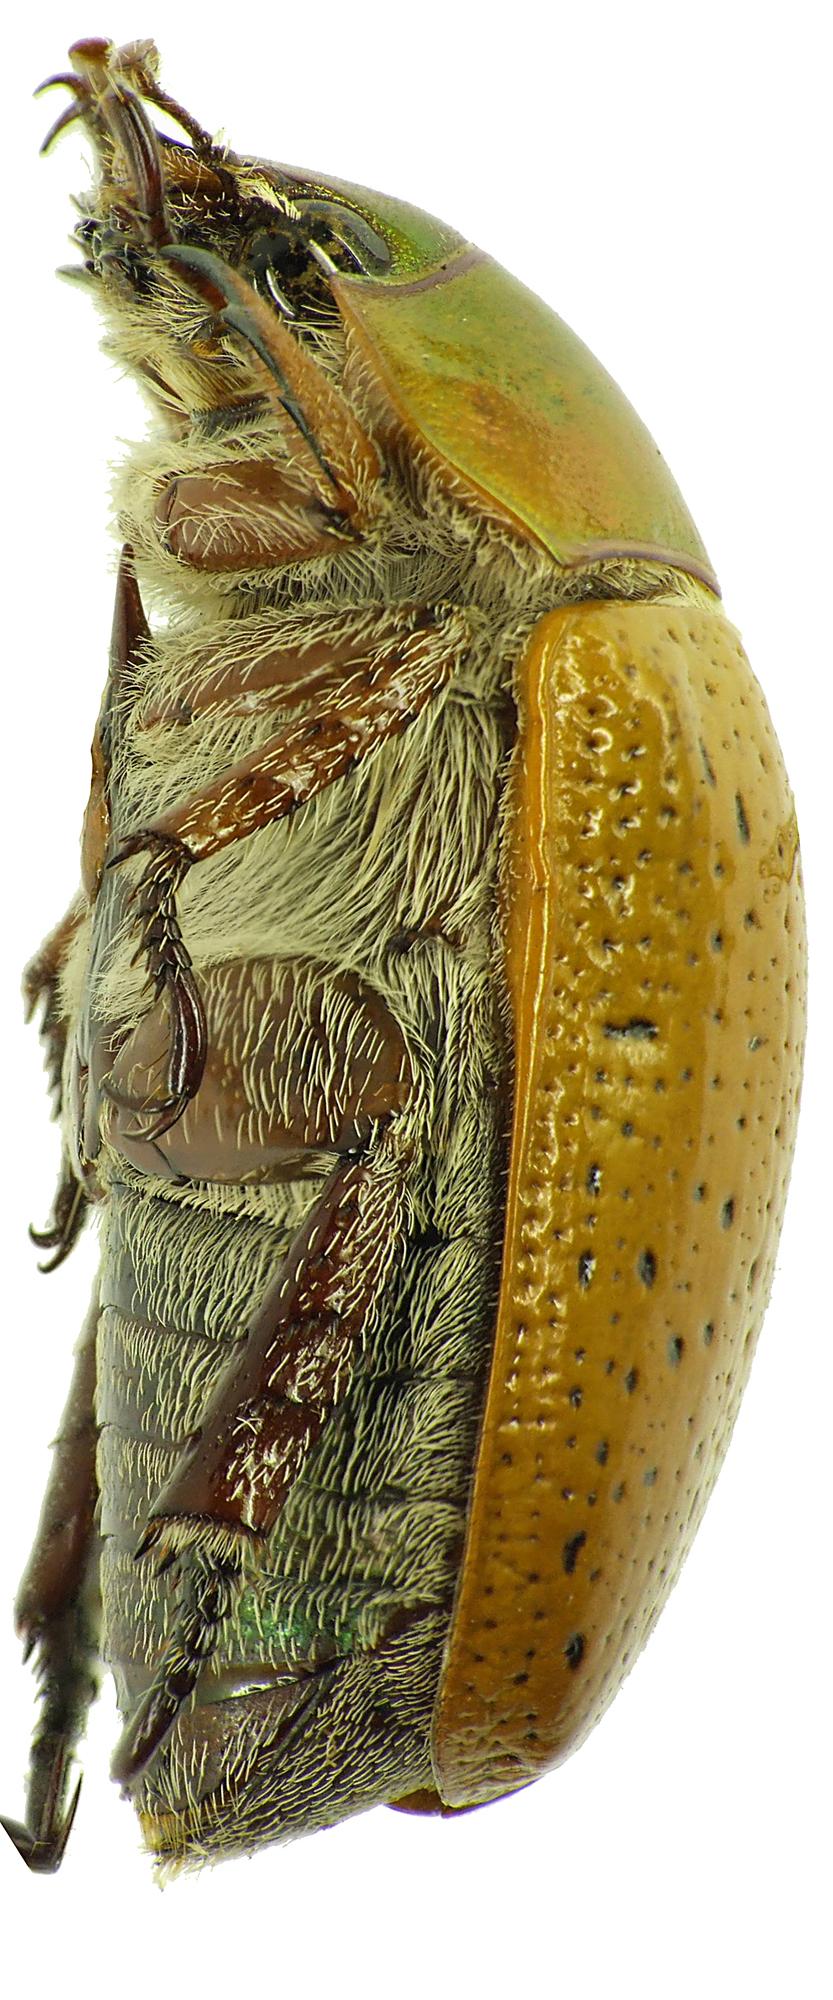 Anoplognathus pectoralis 28980cz85.jpg